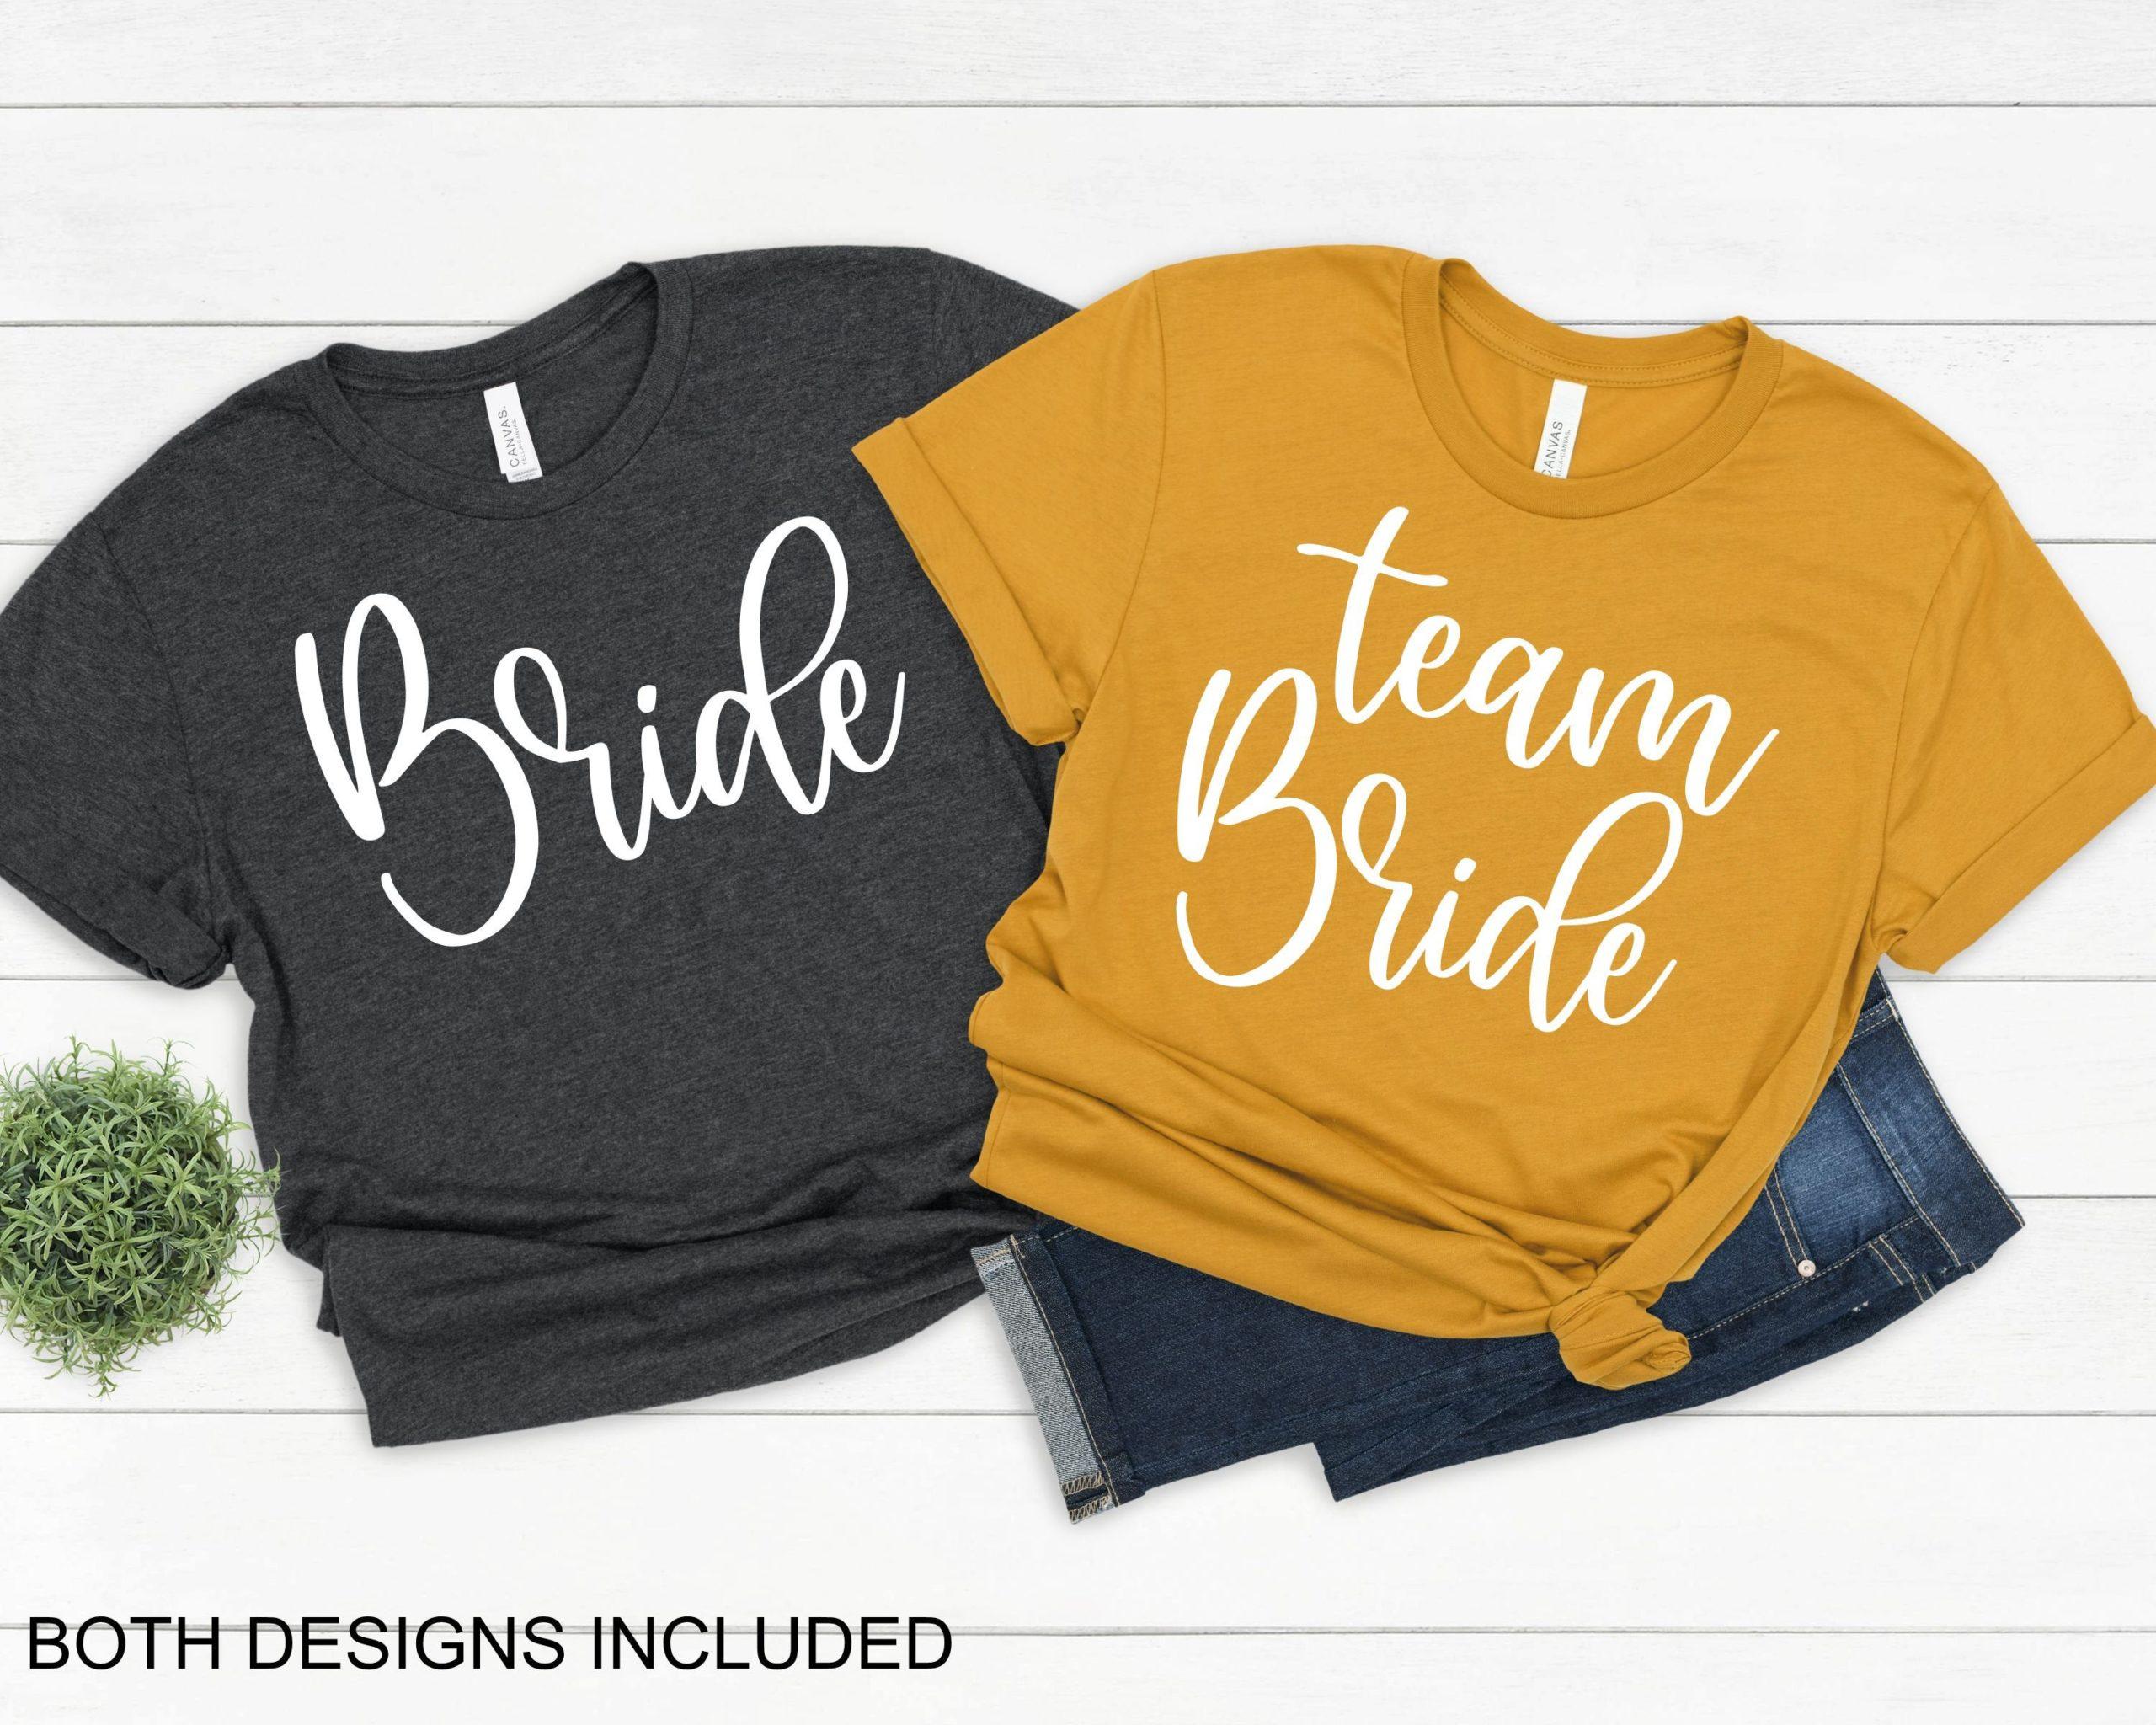 Bride-and-team-bride-svg-team-bride-svg-bridal-party-svg-wedding-svg-design-bachelorette-svg-design-bridesmaid-cricut-svg-600a1638